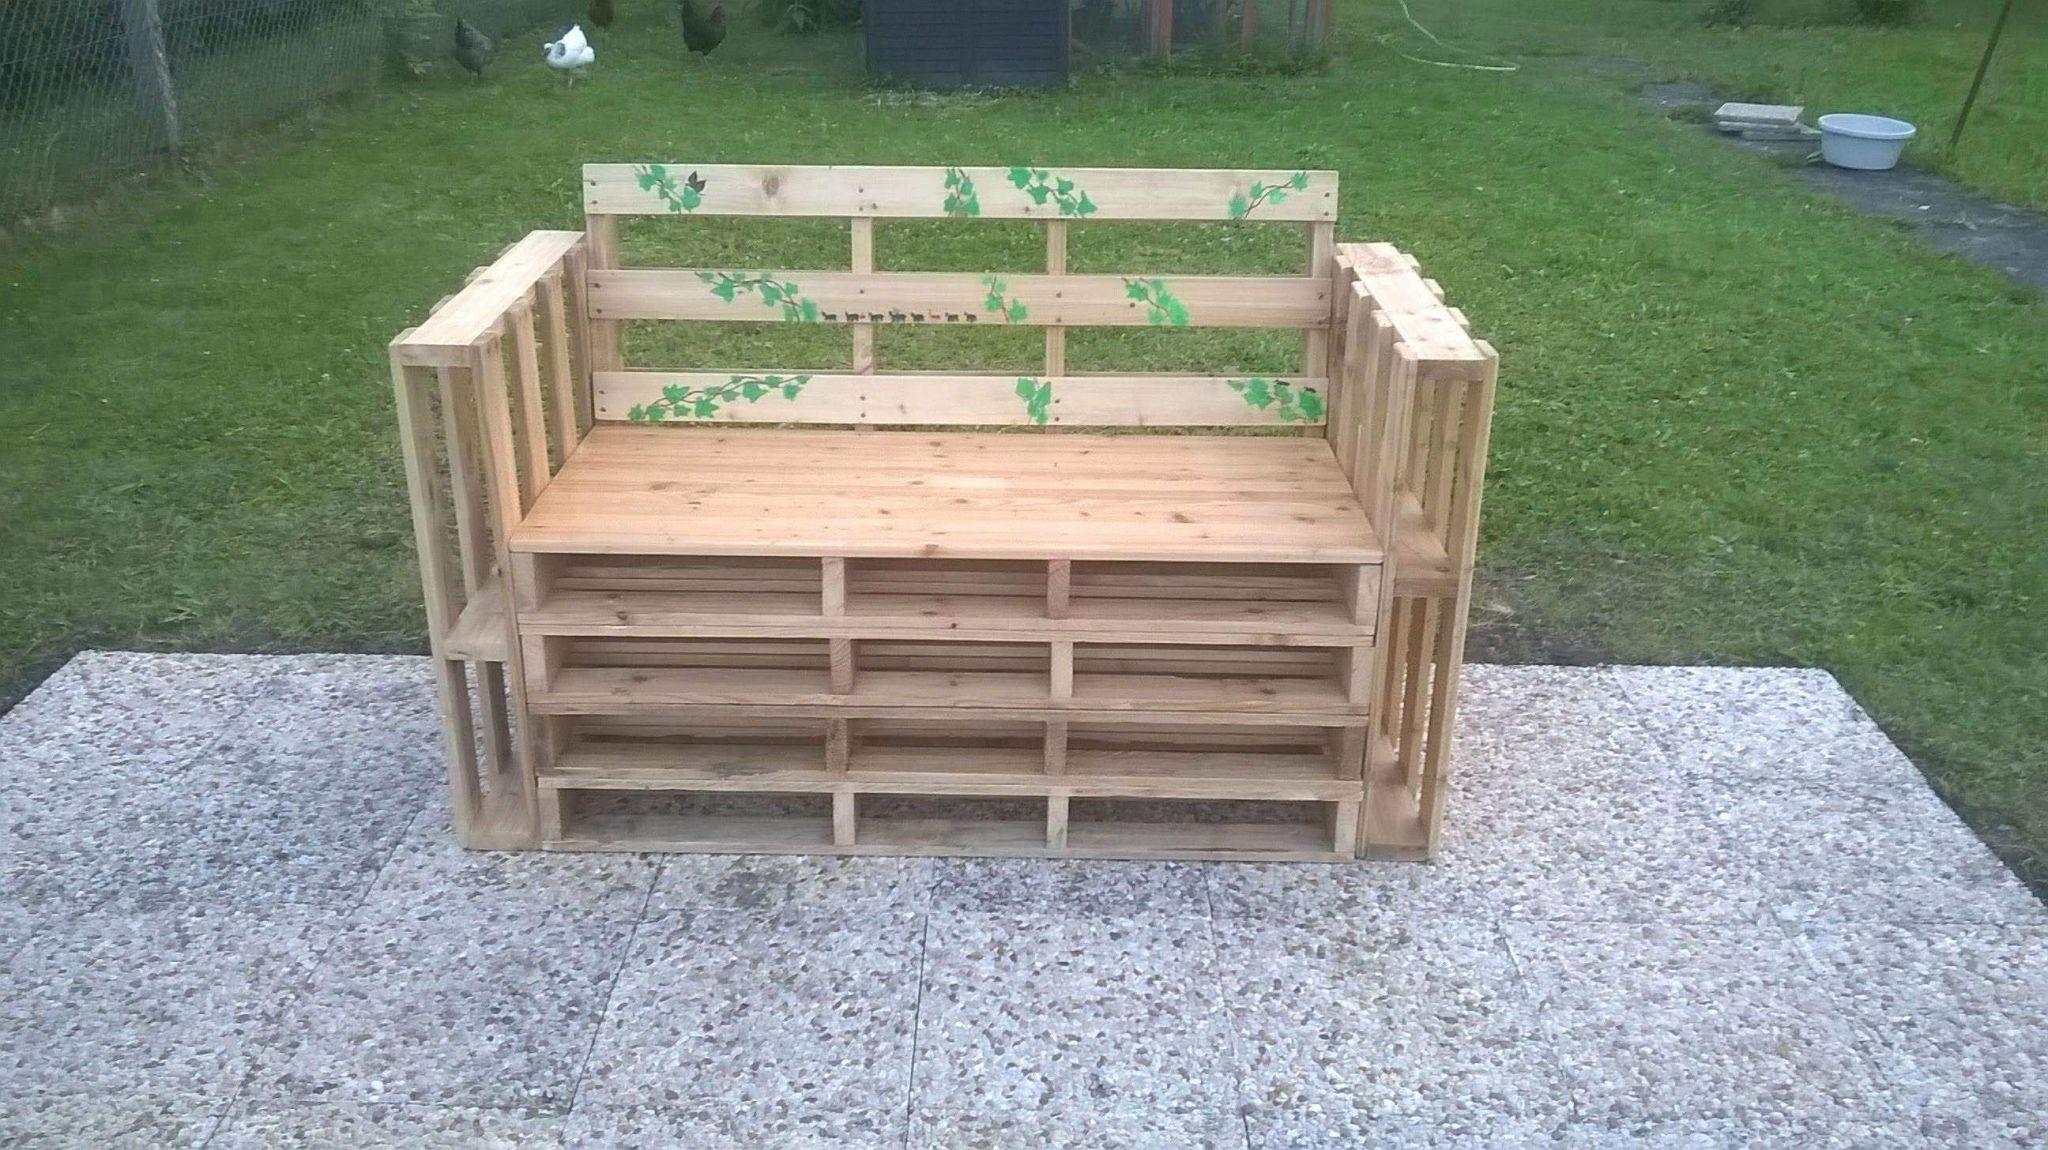 Salon De Jardin Pas Cher Inspirant Amazon Serre De Jardin Frais